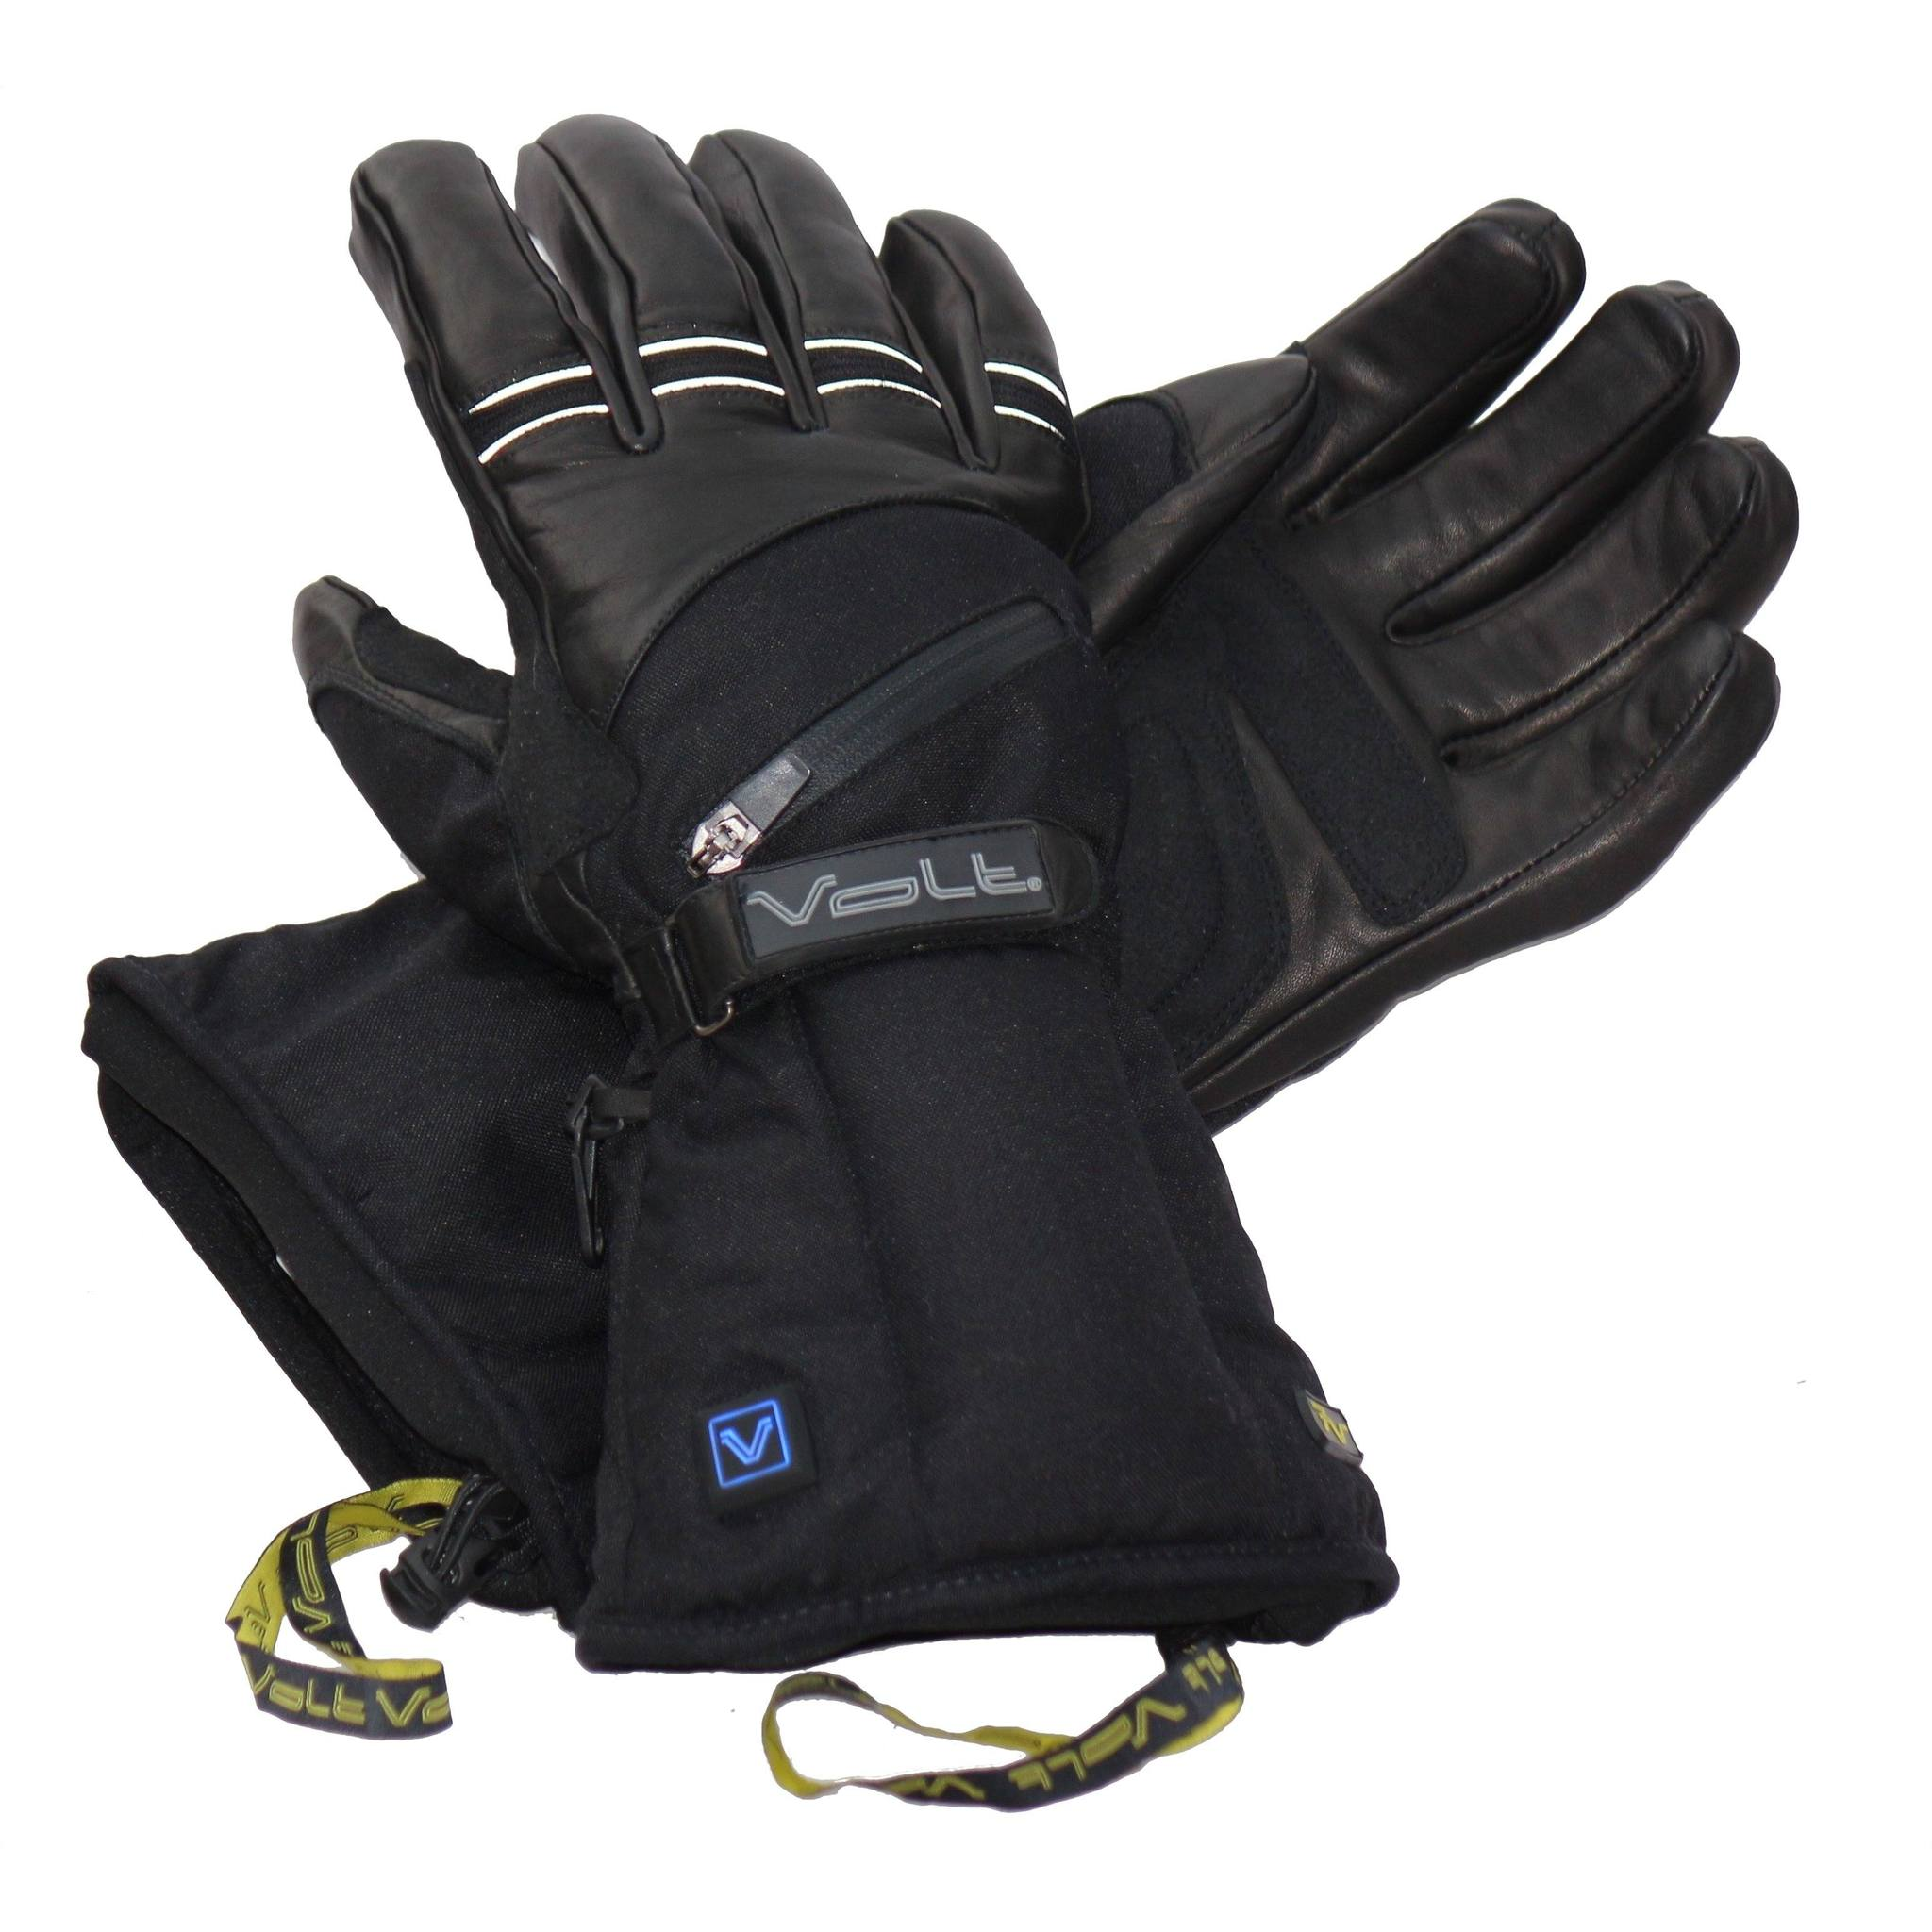 Volt Avalanche X Heated Gloves 2